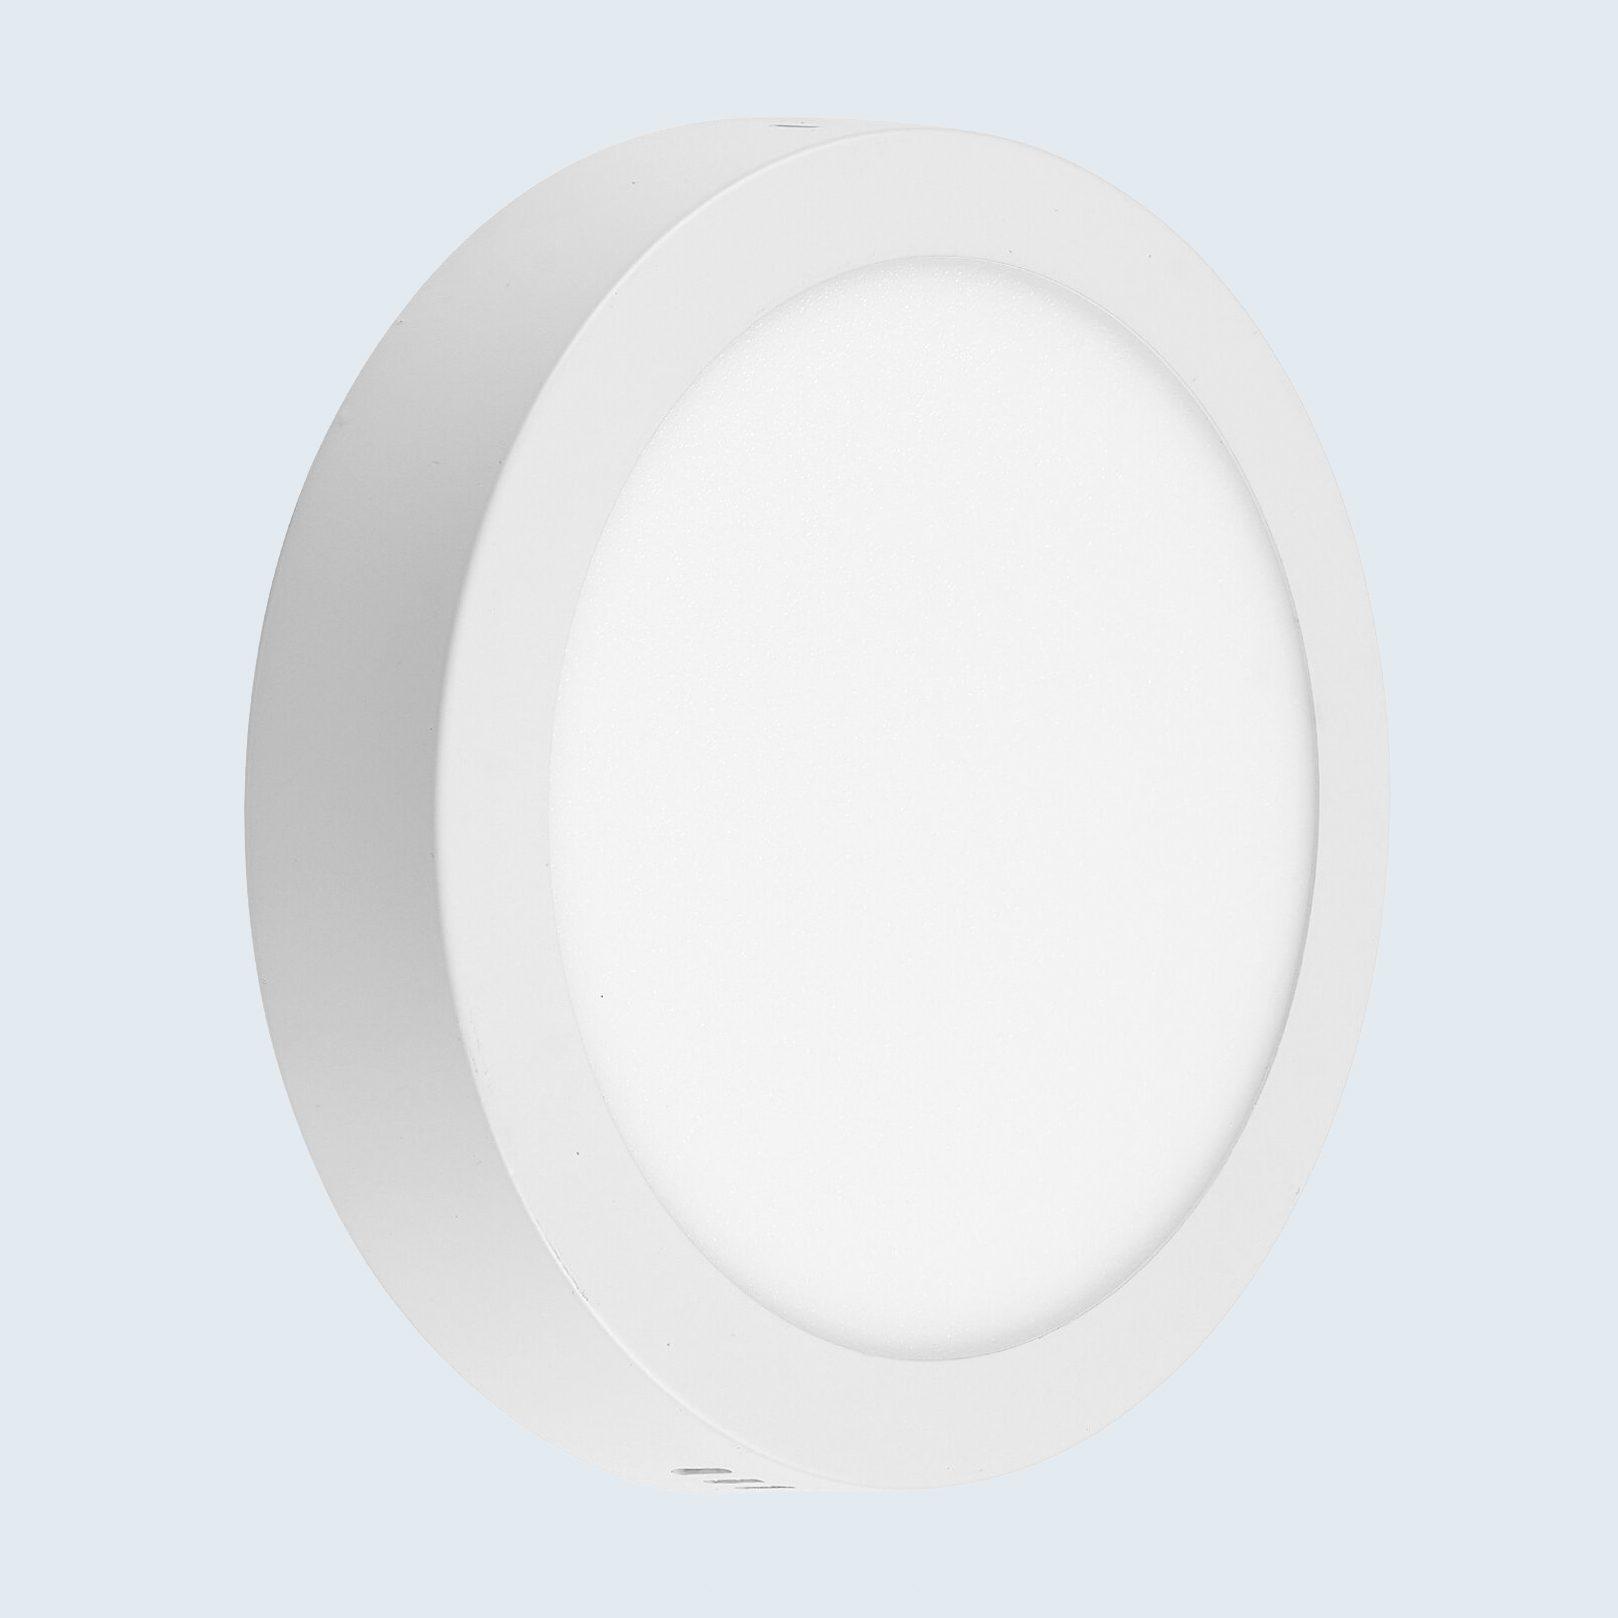 Ebern Designs Mack 1 Simple Circle LED light for the closet